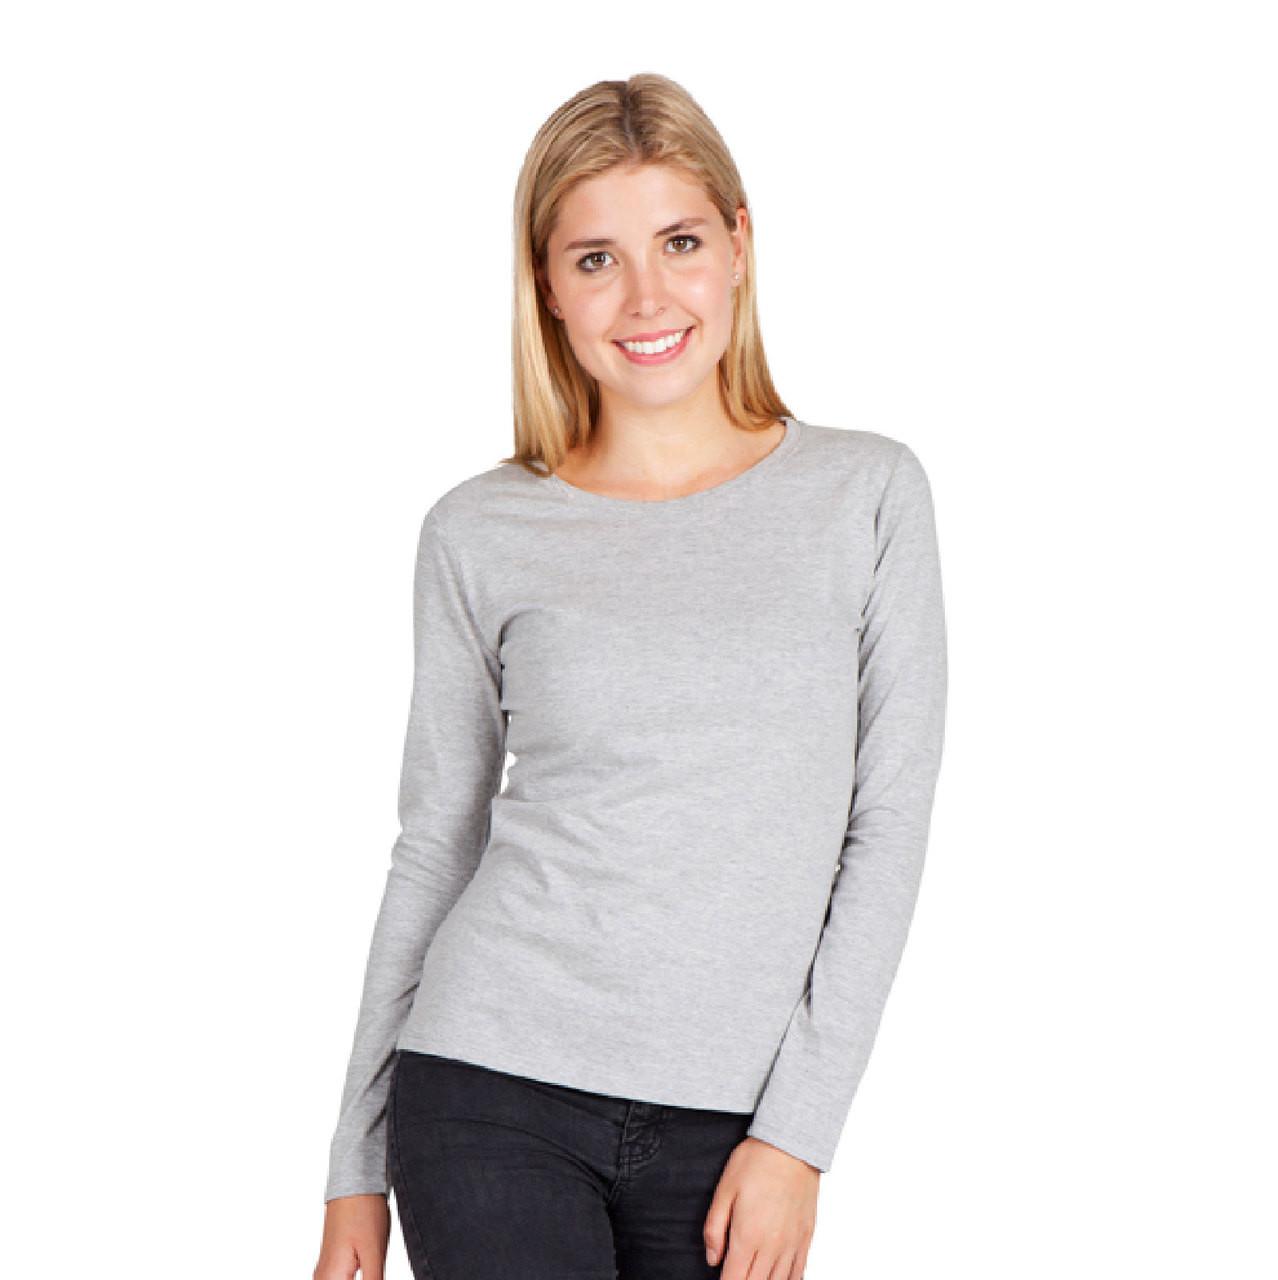 77c4767acad LARA Plain Ladies Long Sleeve Tshirts Online